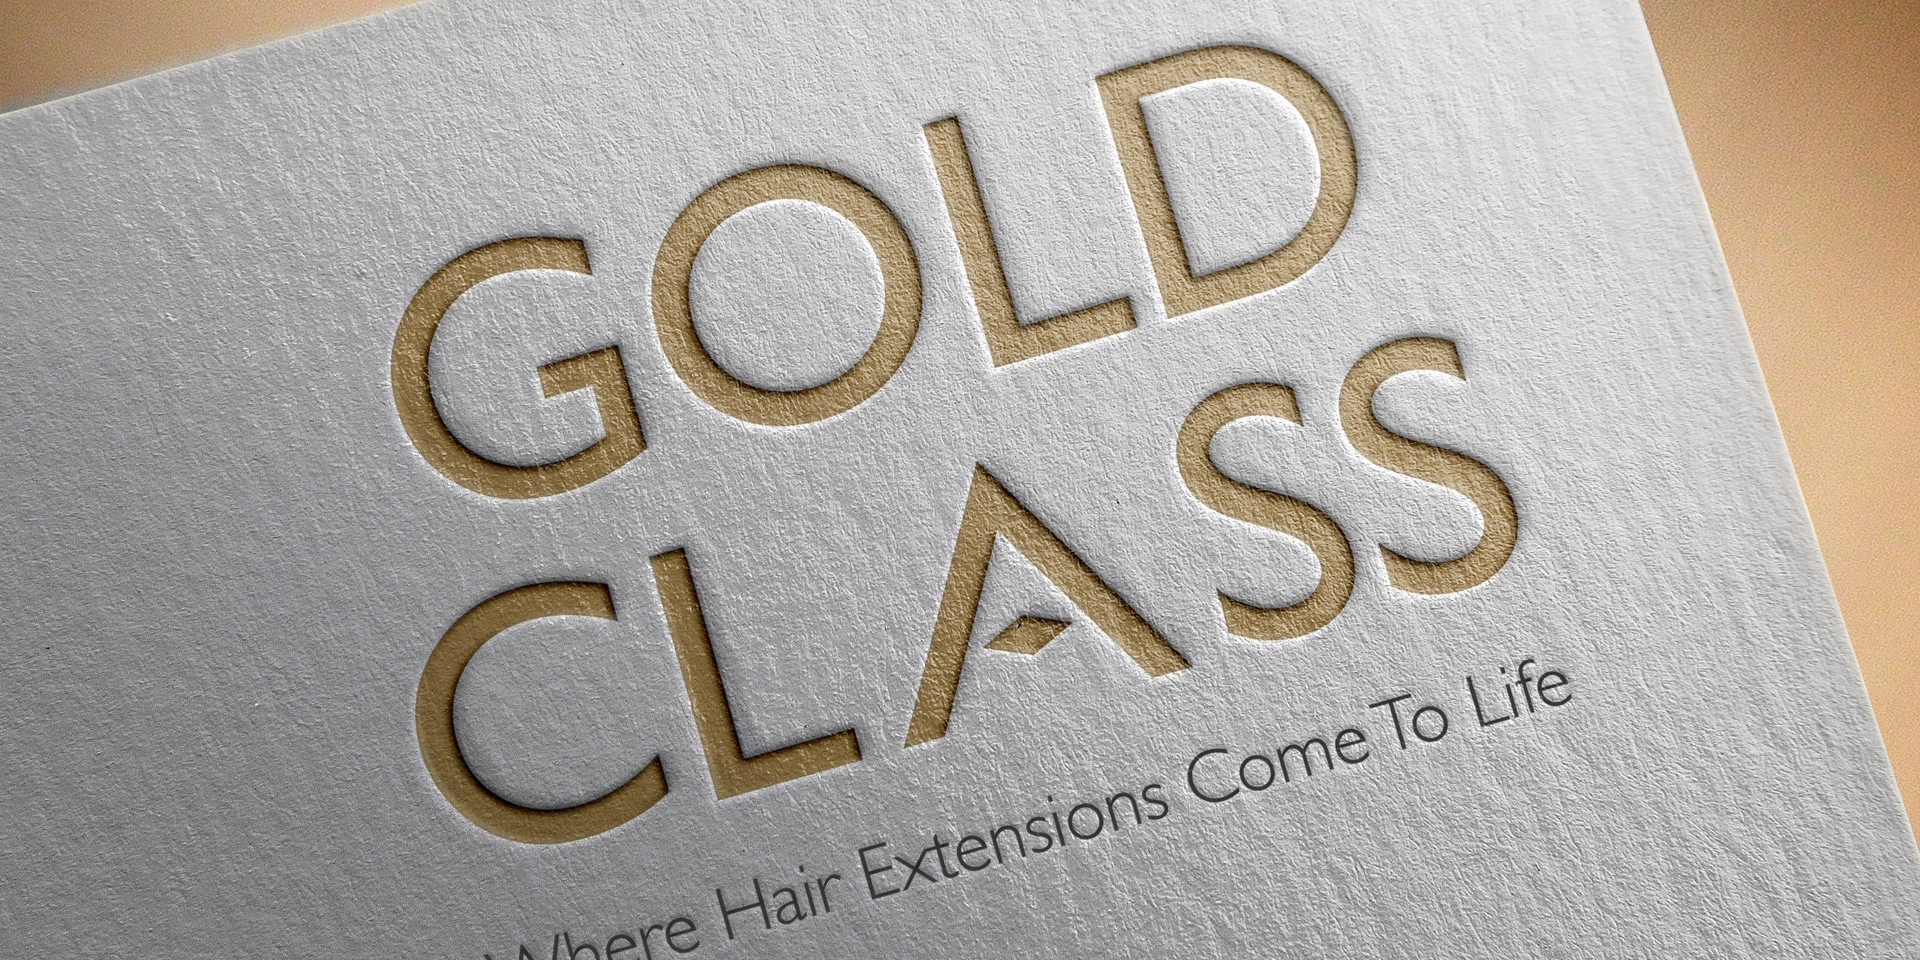 GoldClass_on paper.jpg